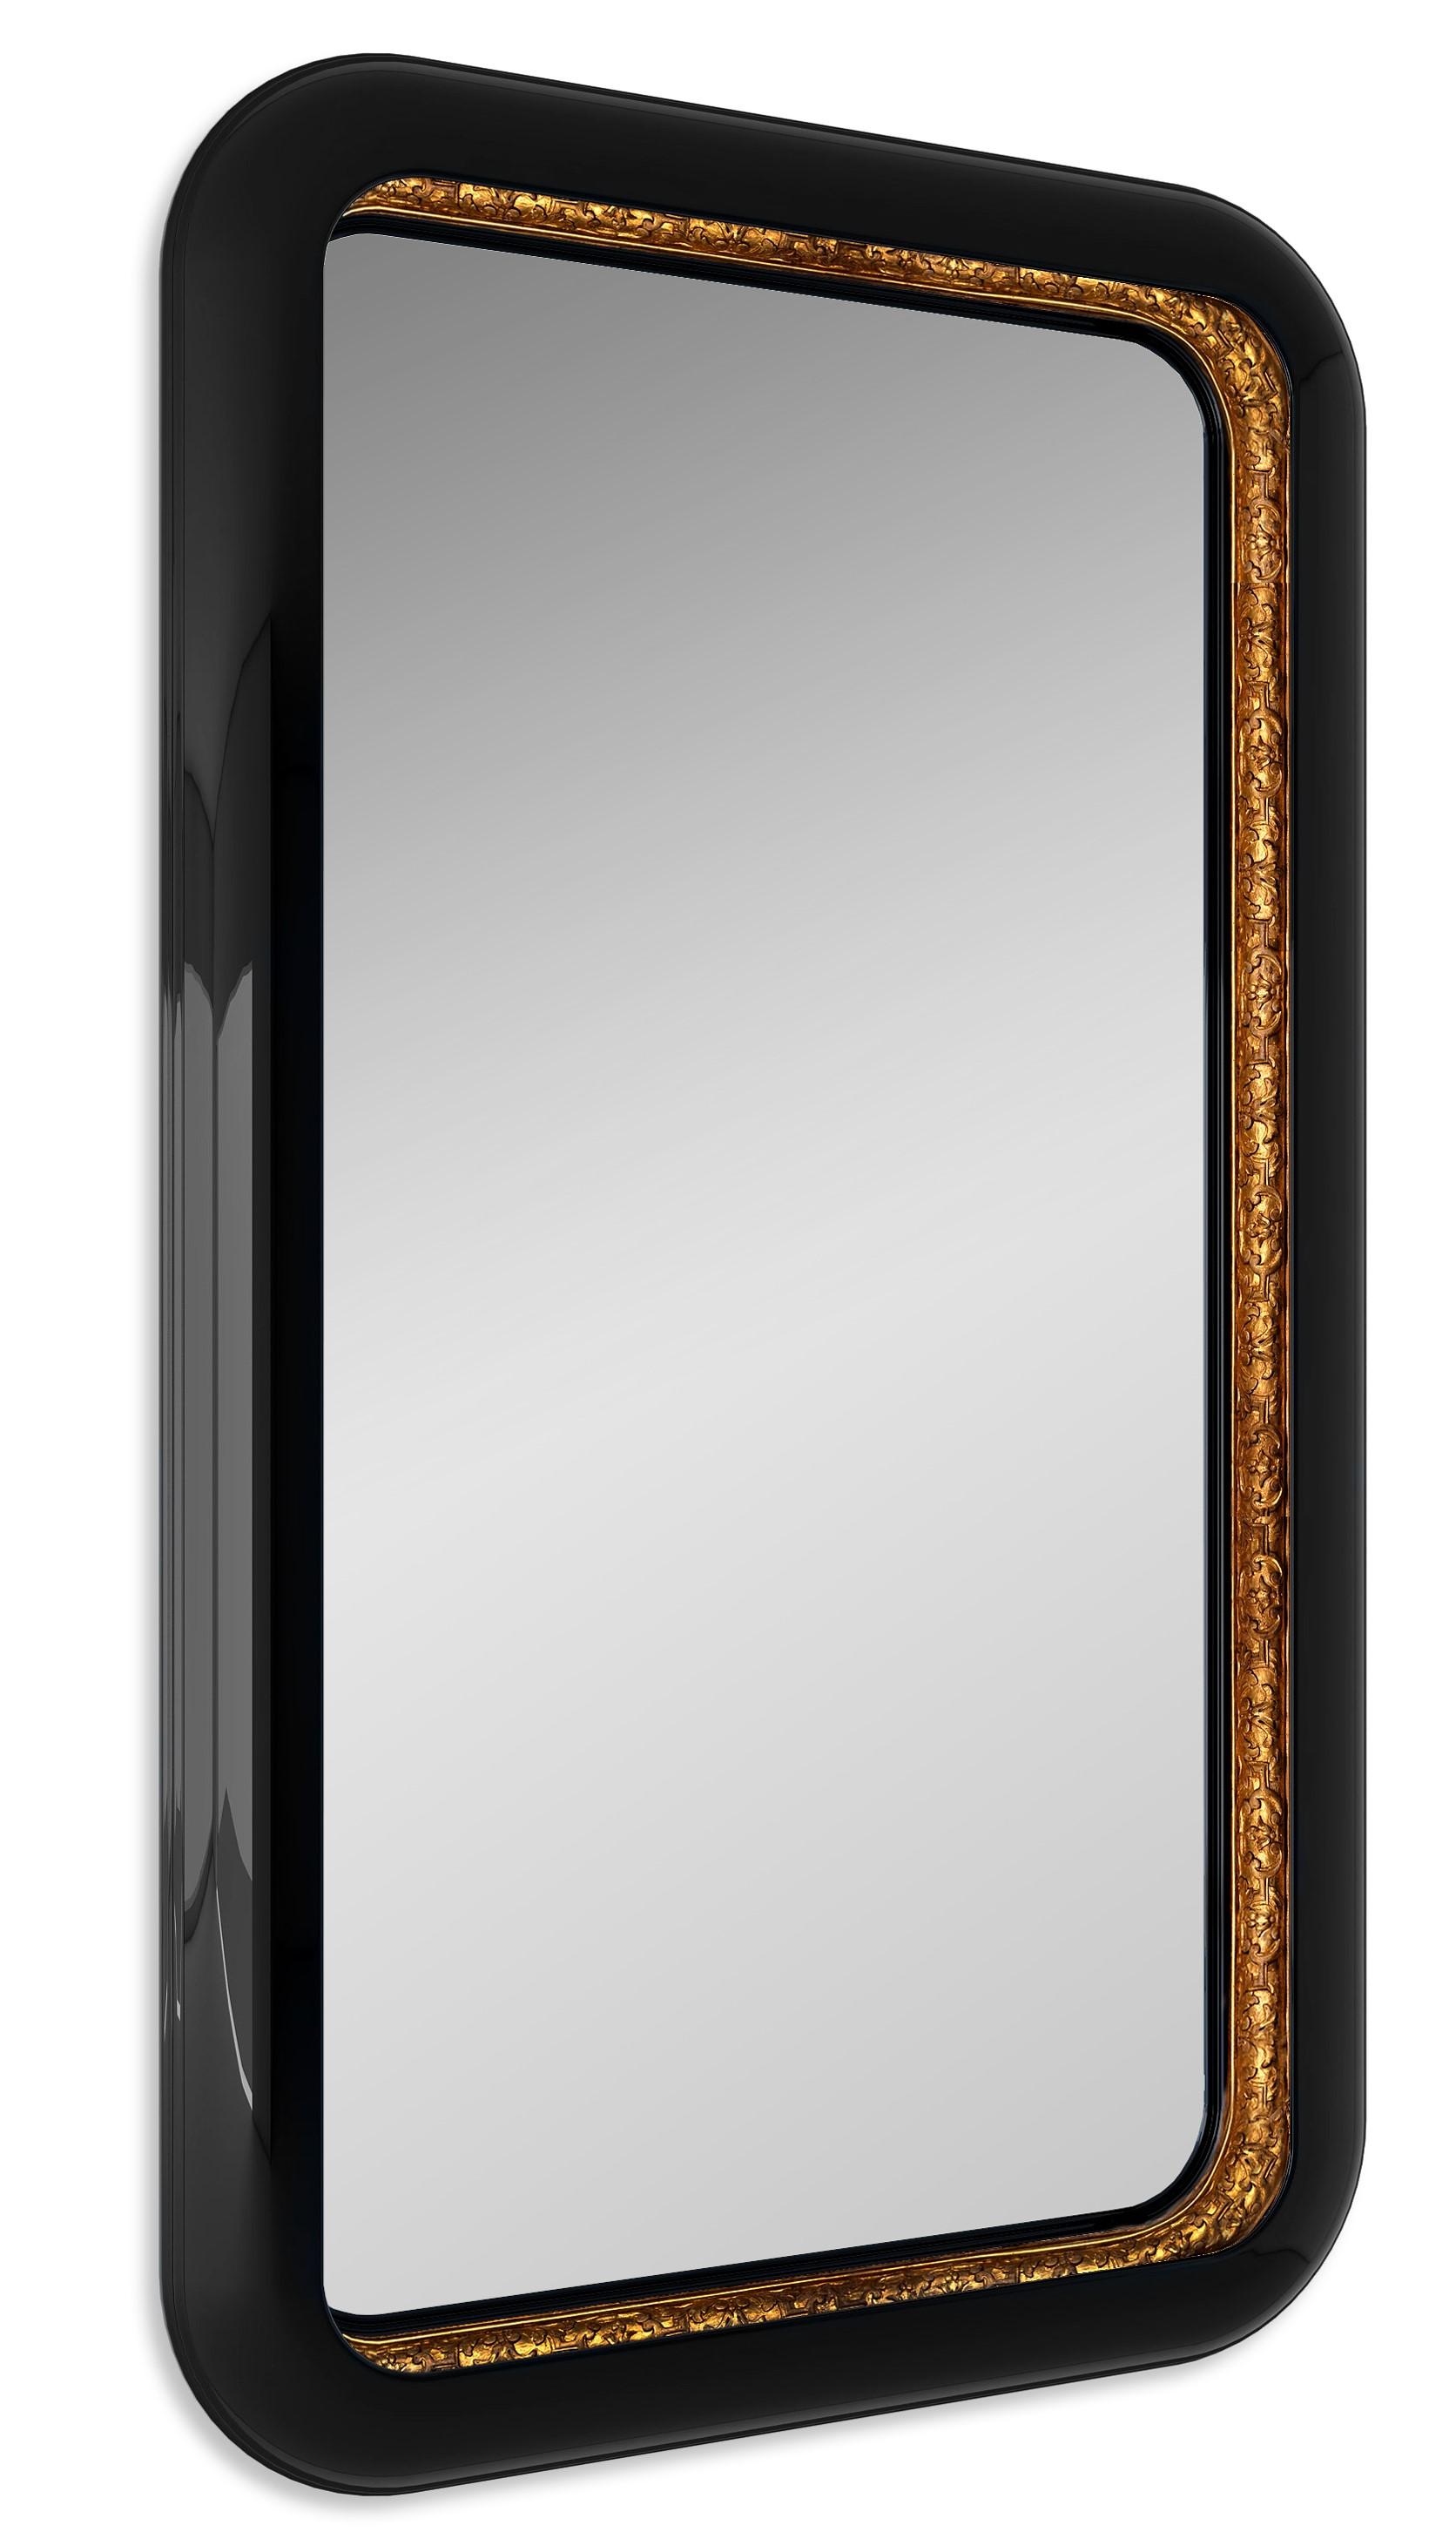 Bathroom Trends, interior design, maison valentina, bathroom design, trends for 2019 bathroom trends Shop the Look – Bathroom Trends by Maison Valentina ring rectangular mirror 2 HR